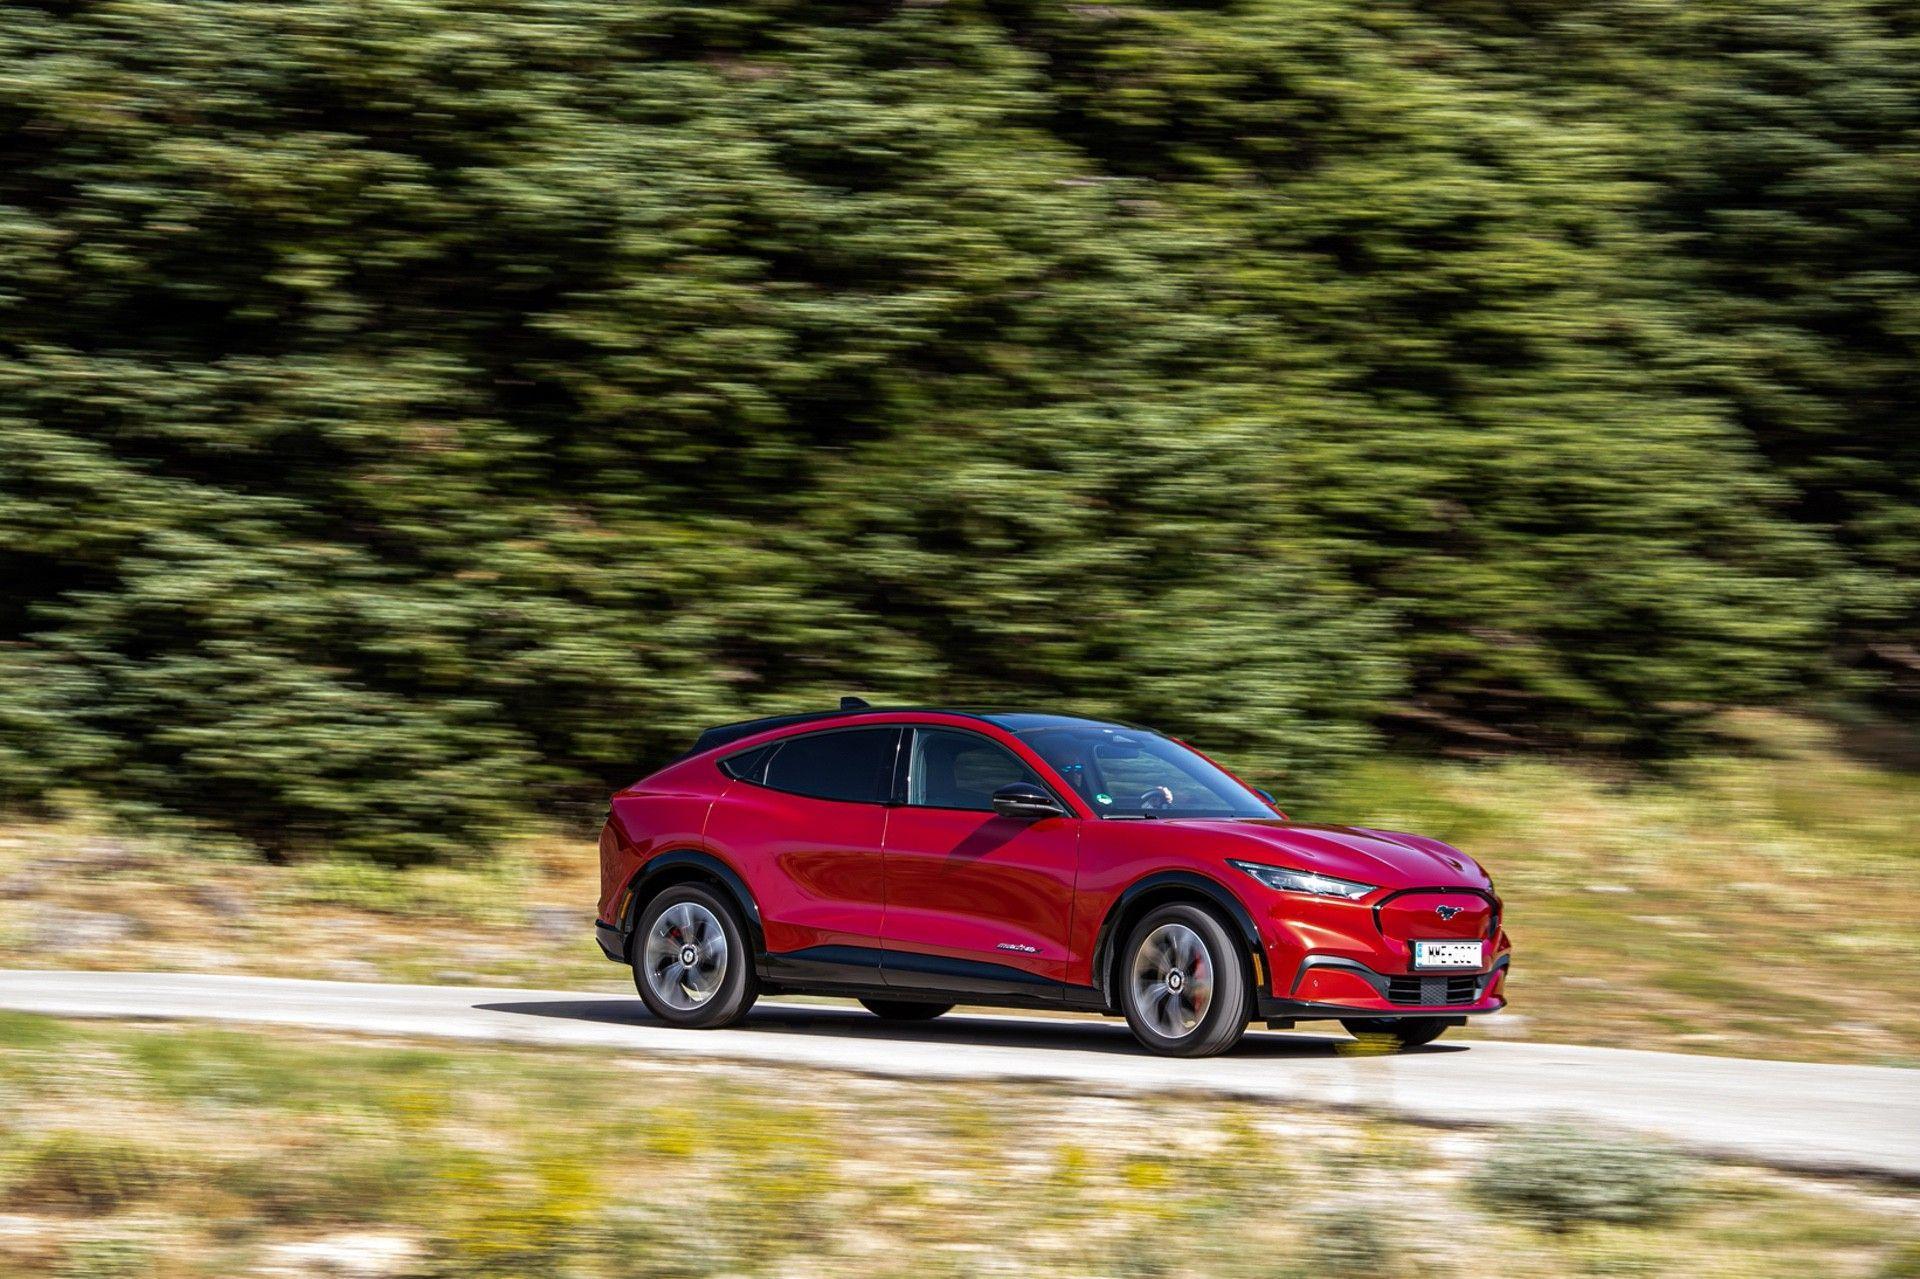 Ford_Mustang_Mach-E_greek_presskit-0137